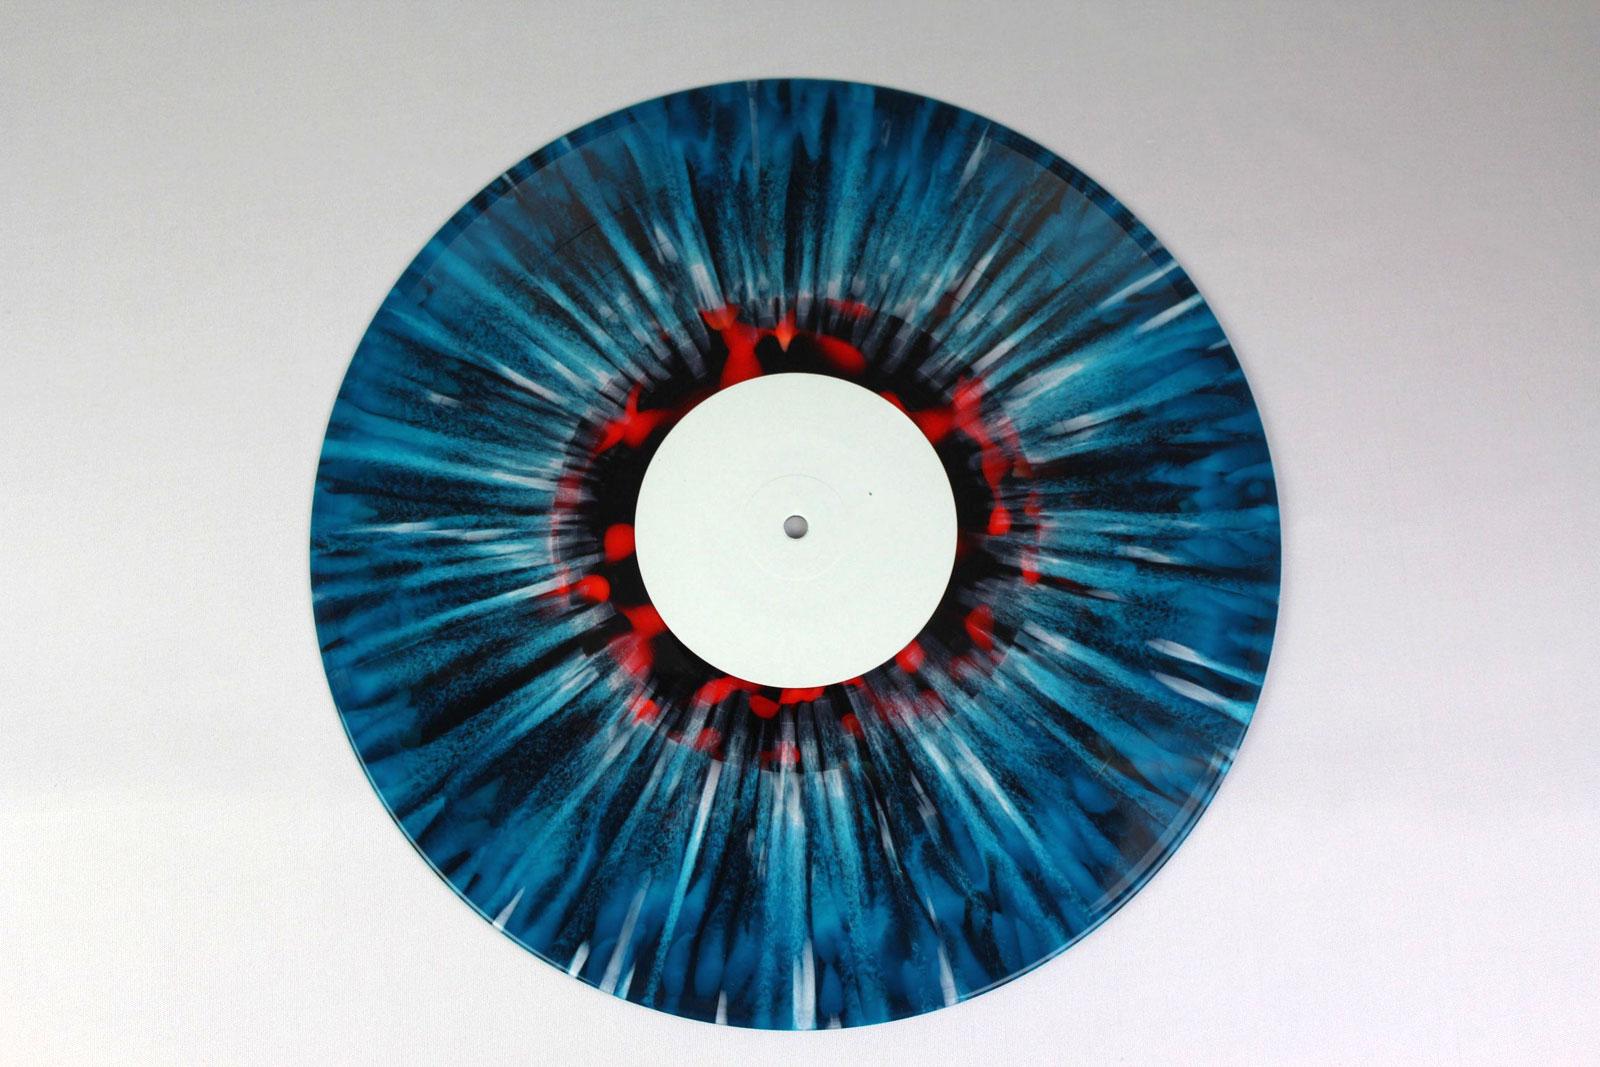 50% green, 50% blue / Splatter: white / coloured circle: red transparent